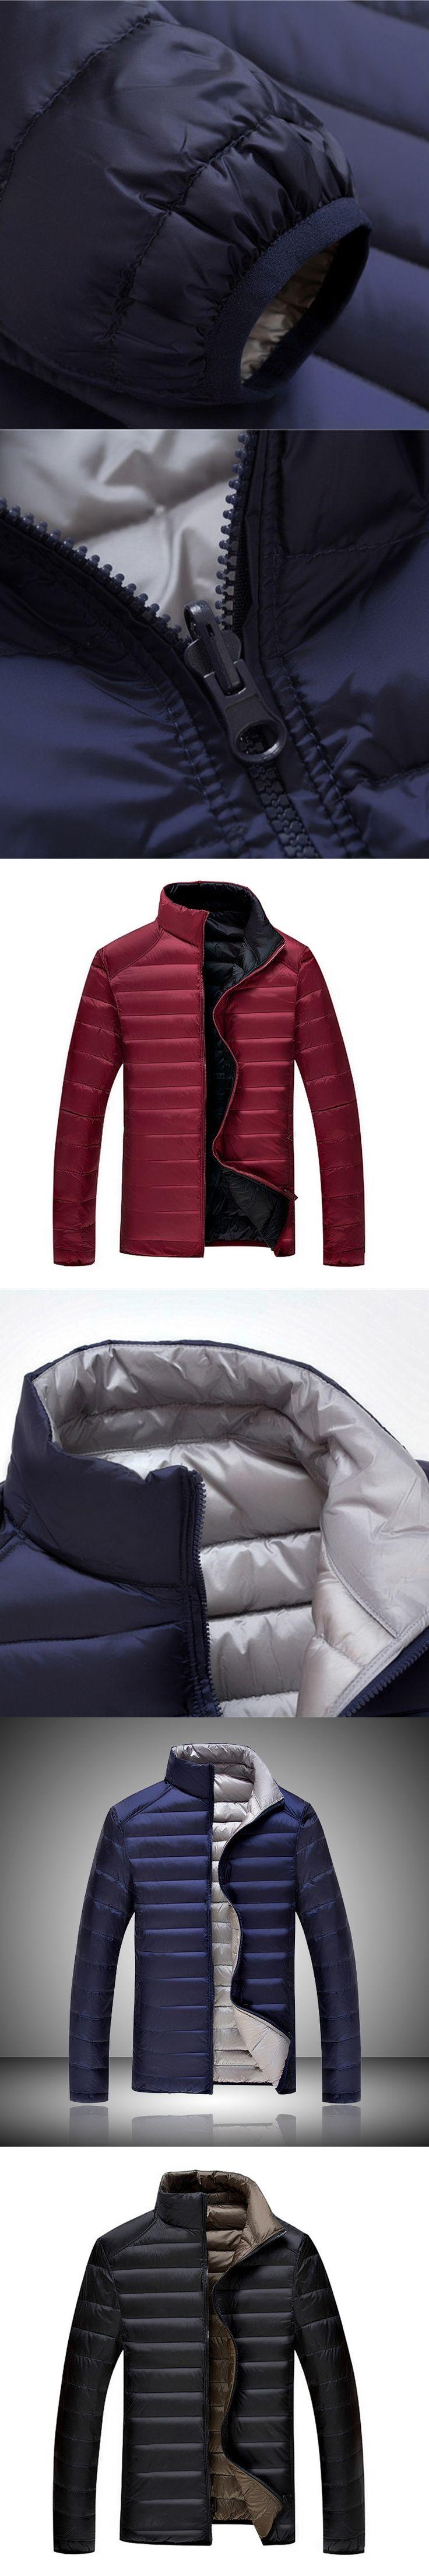 Autumn Winter Hot Sale 2017 New Mens Jacket Plus Size Jacket Men Fashion Coats Casual Outerwear Warm Jackets Men YRF-001